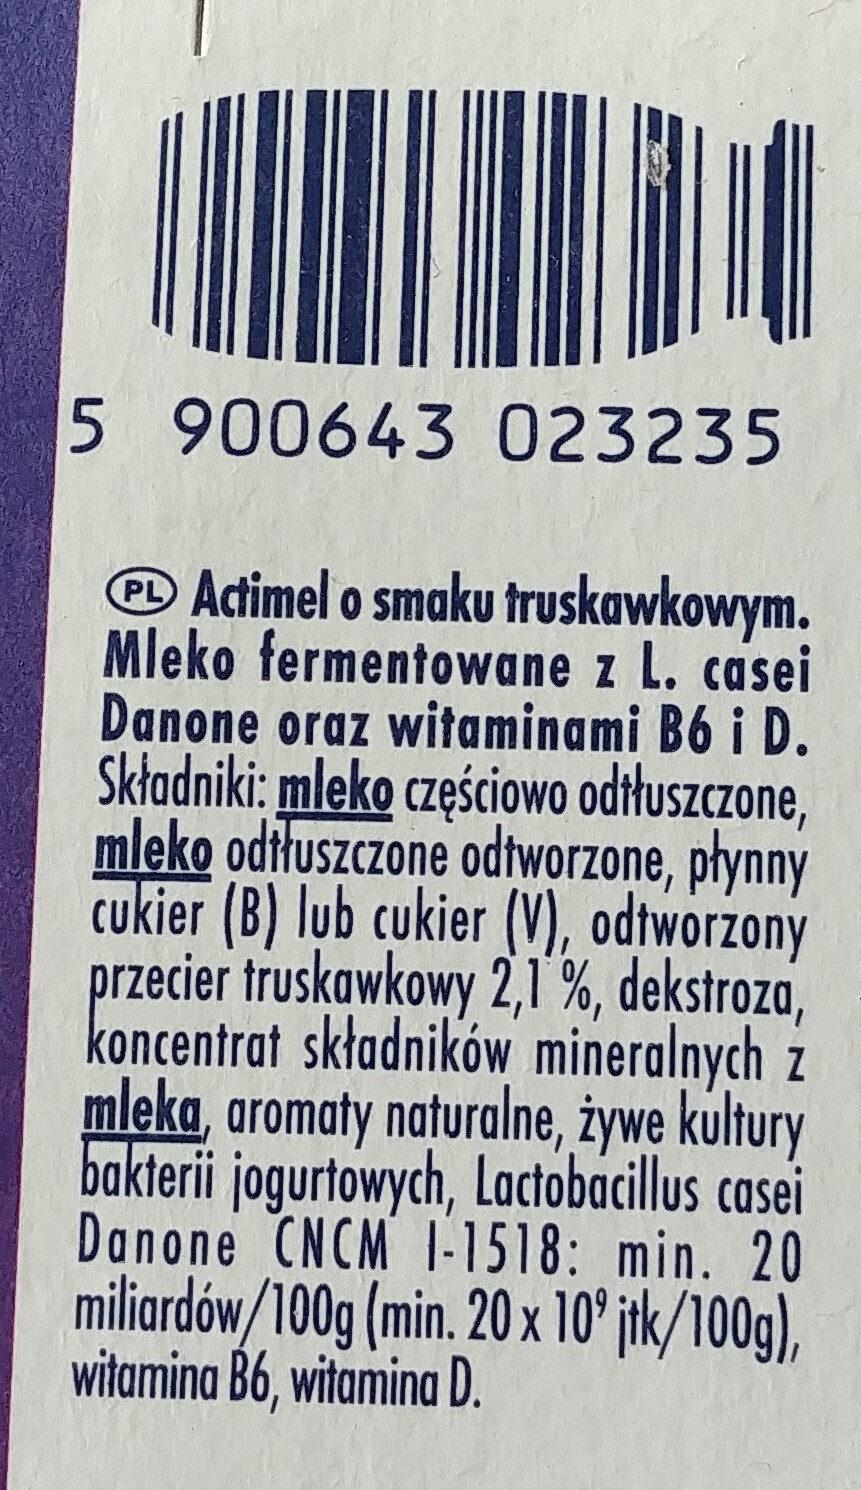 Actimel fraise - Składniki - pl